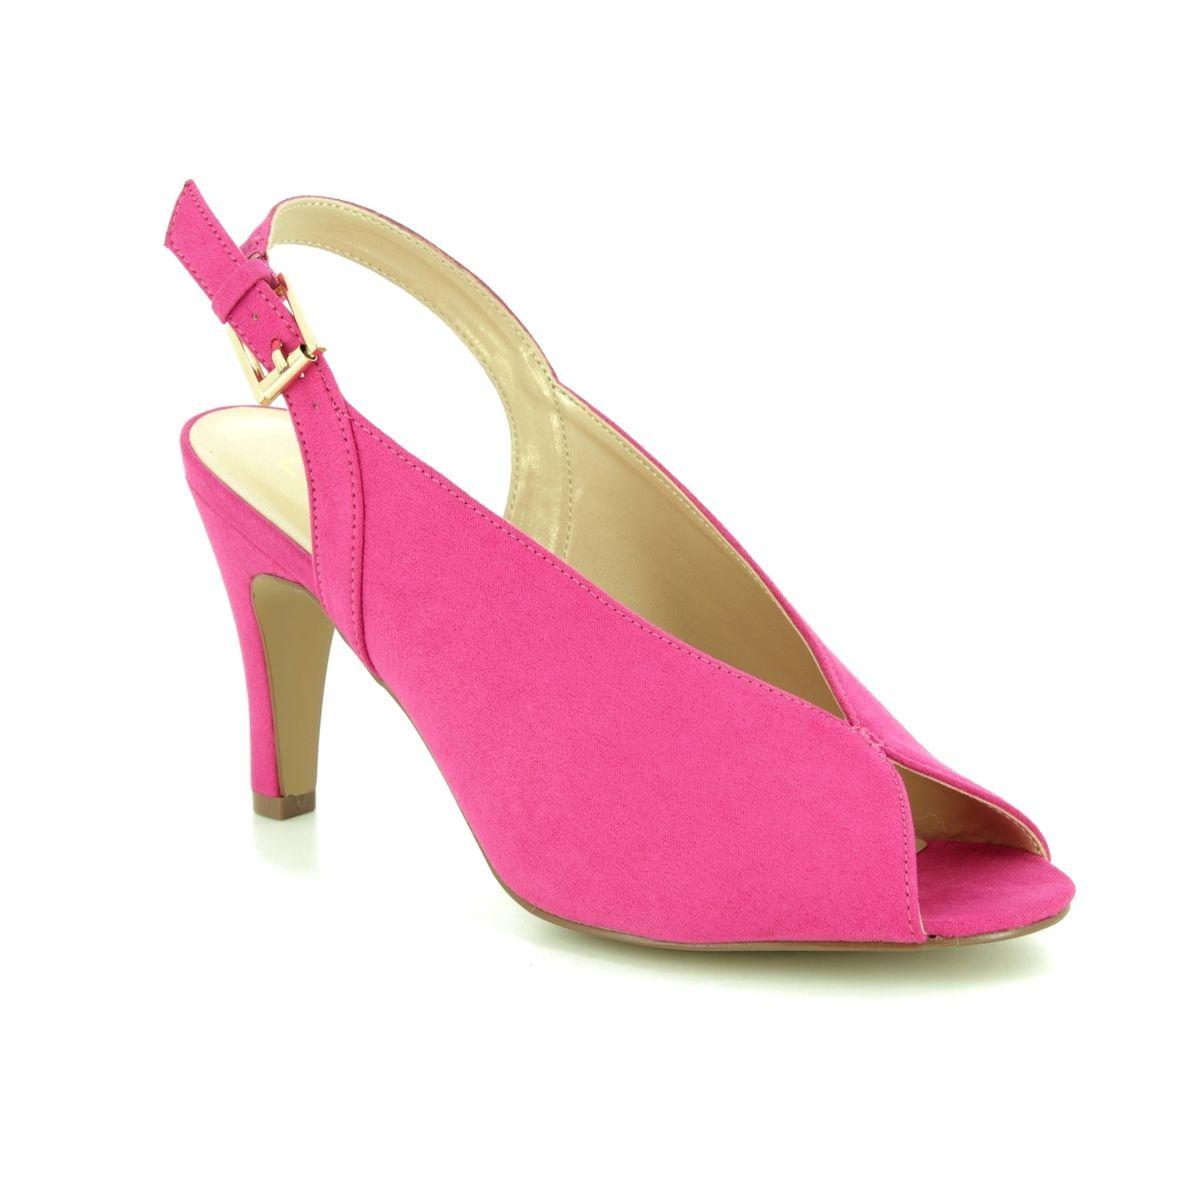 a85109e6d86 Lotus Slingback Shoes - Fuchsia - ULS066 62 AKIKO